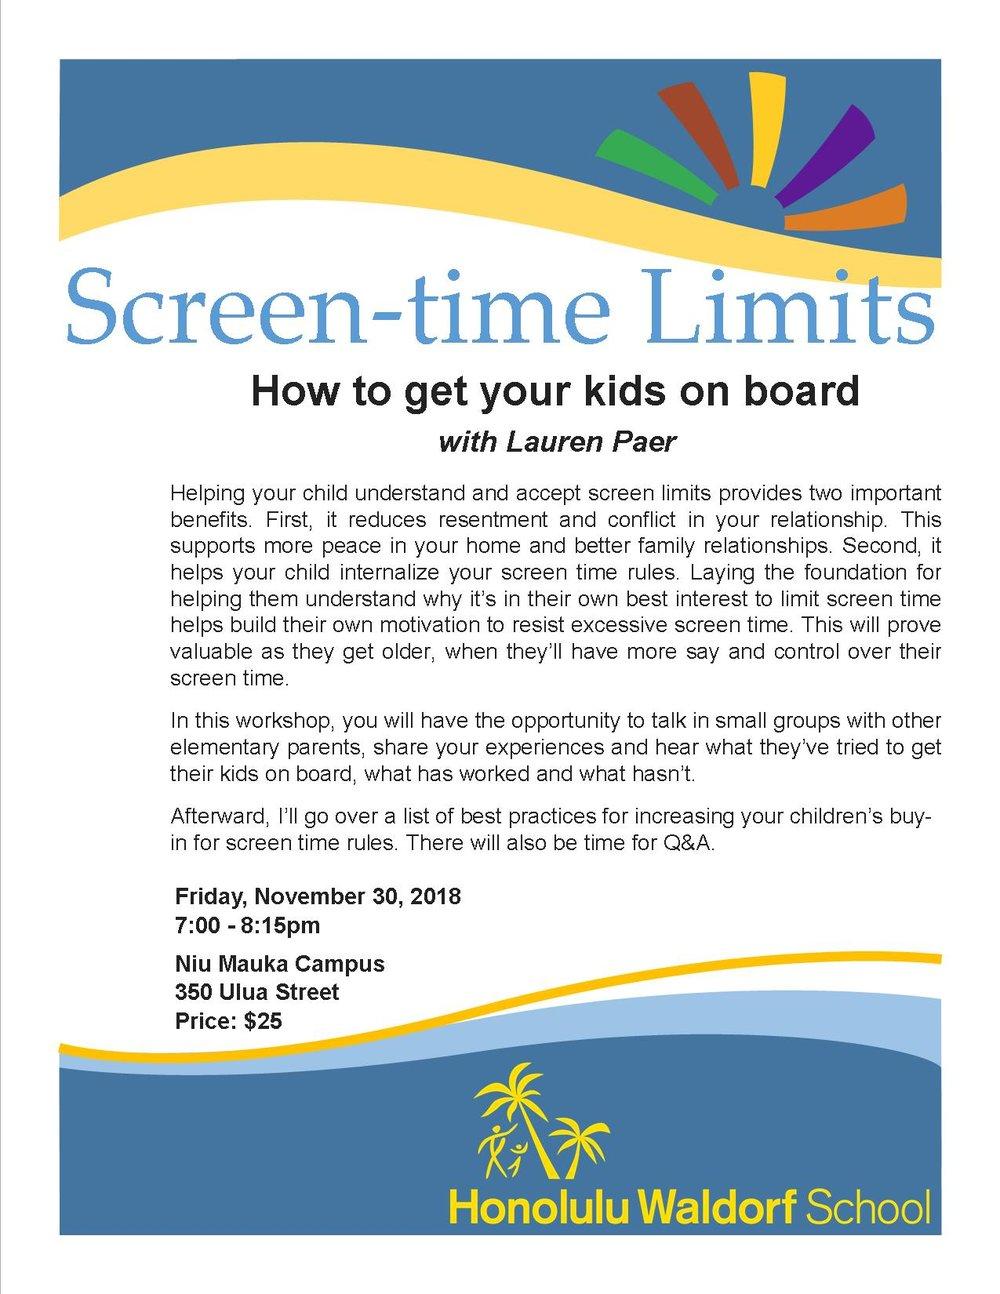 2018_11_30_Lauren Paer_Screen Time Limits.jpg